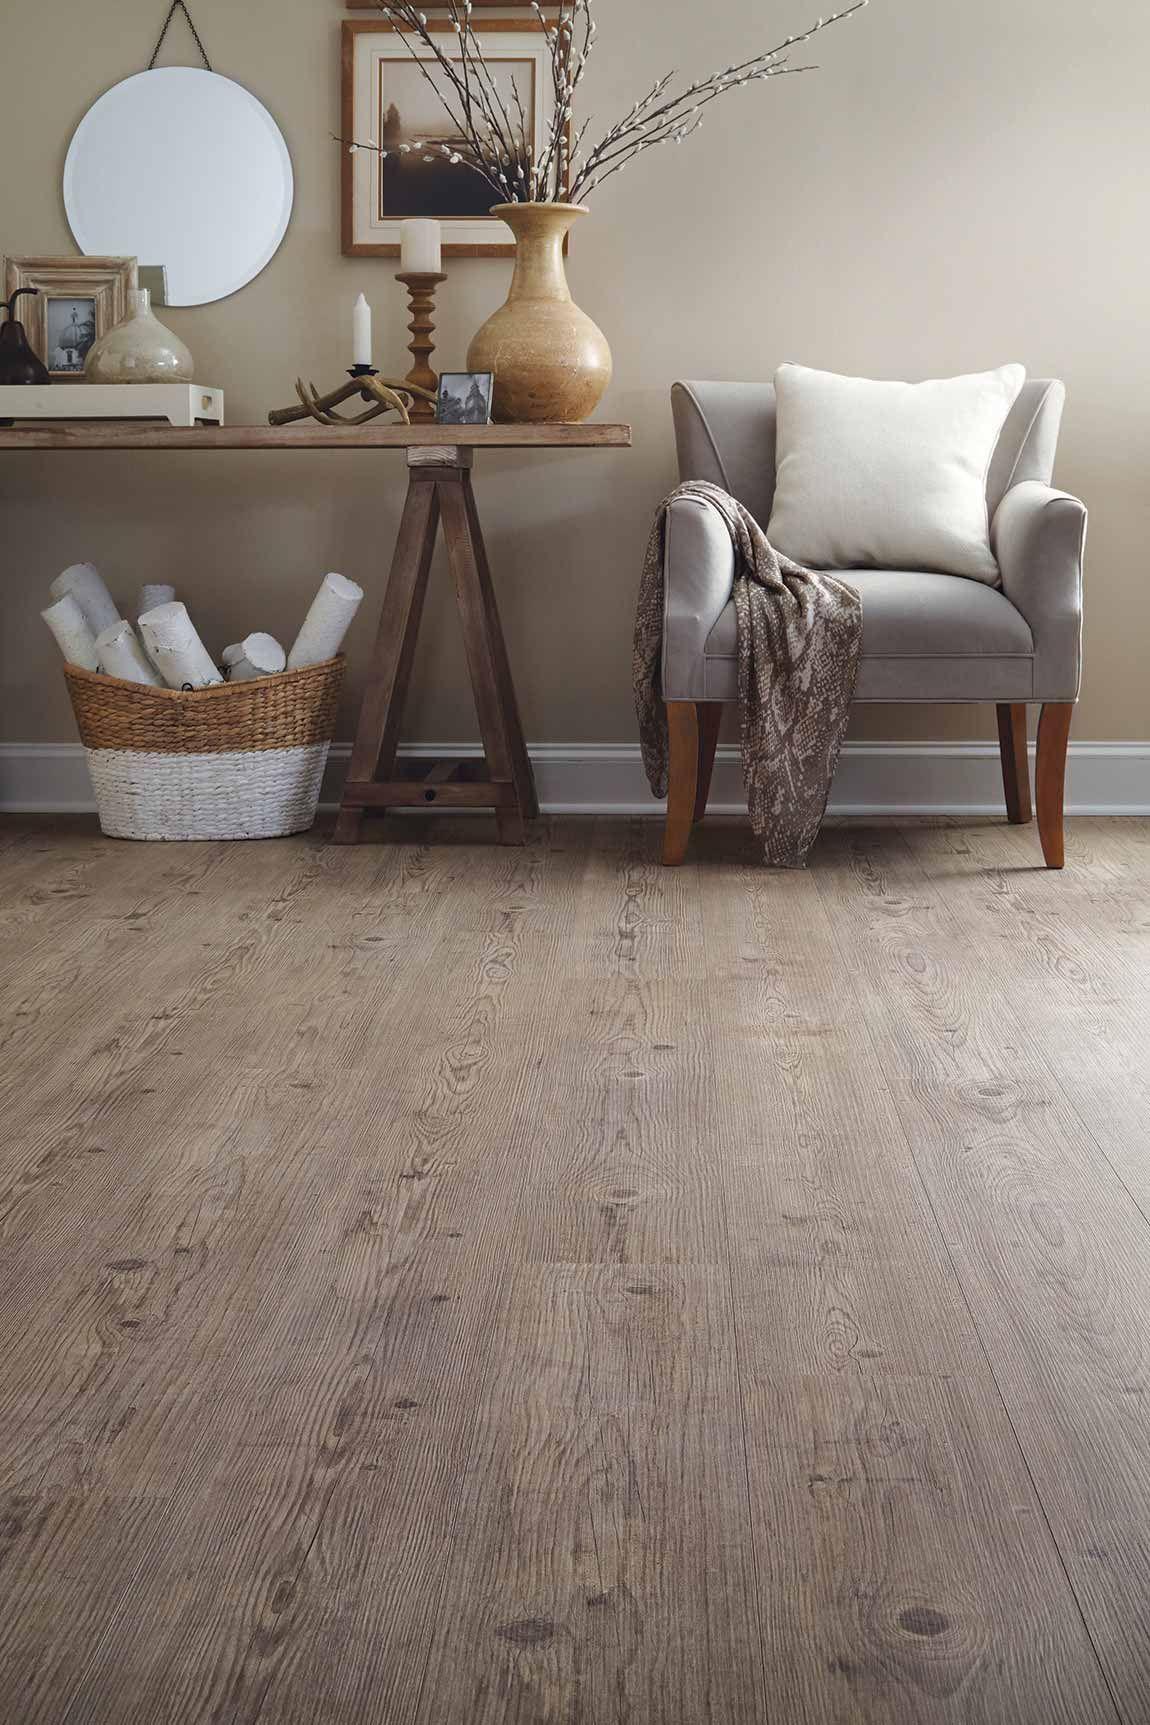 Living Room-Transitional-Wood Look-Medium | Laminate ...